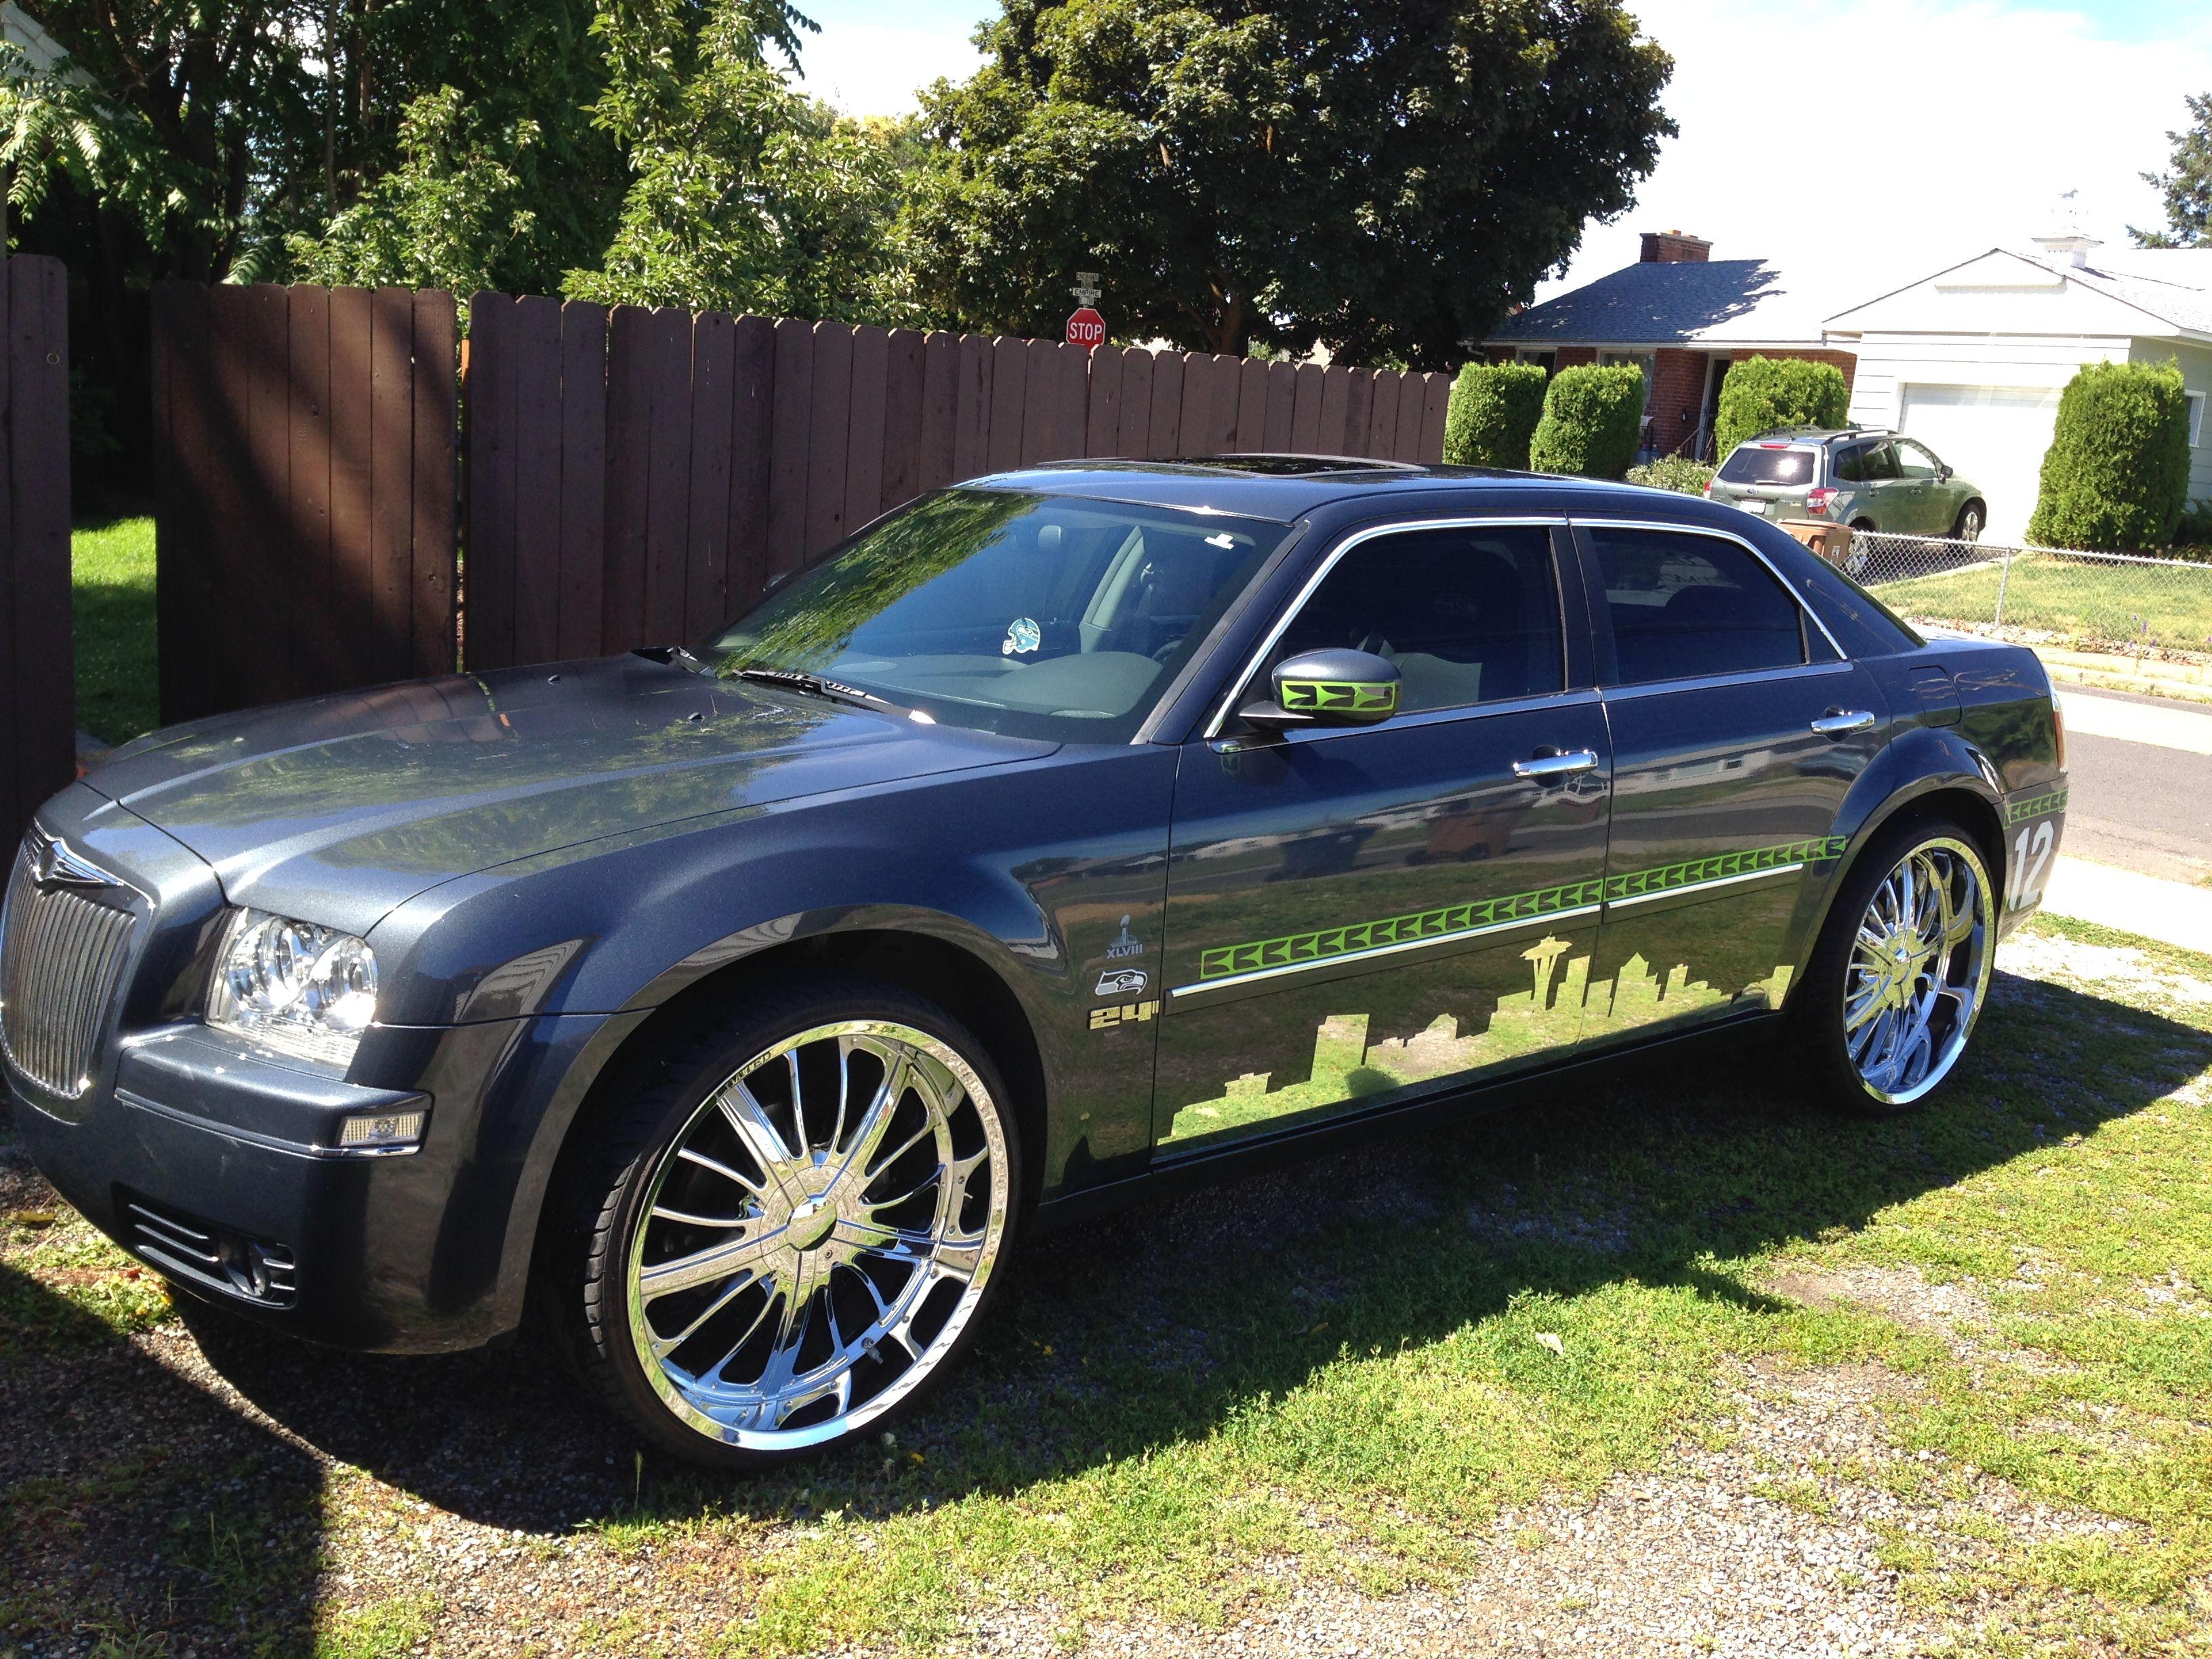 24 wheels chrome - Beastmode 24 Inch Rims Chrysler All Seahawks Everything Chrome Skyline